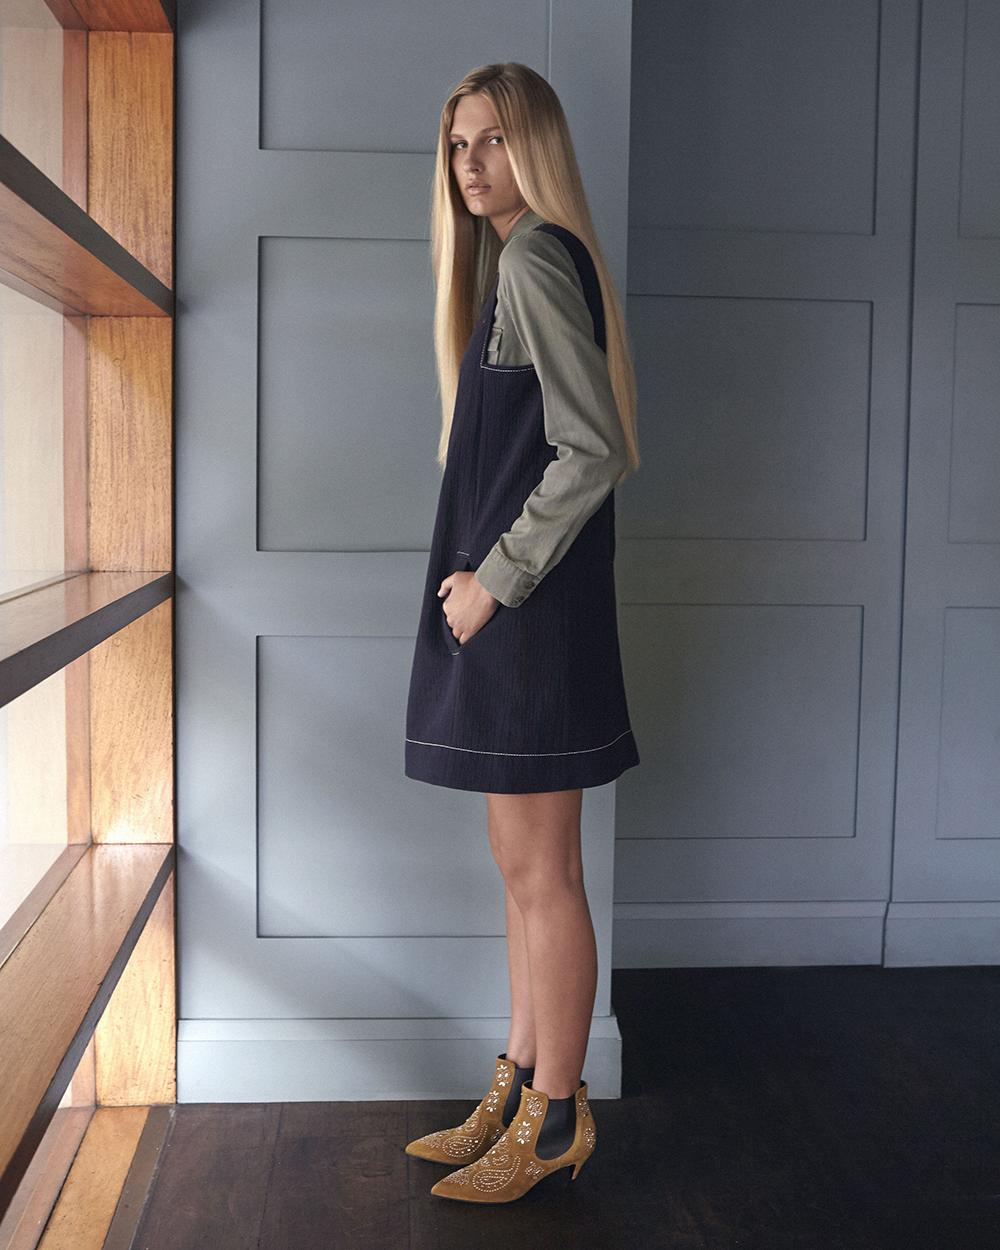 Isabell Klem